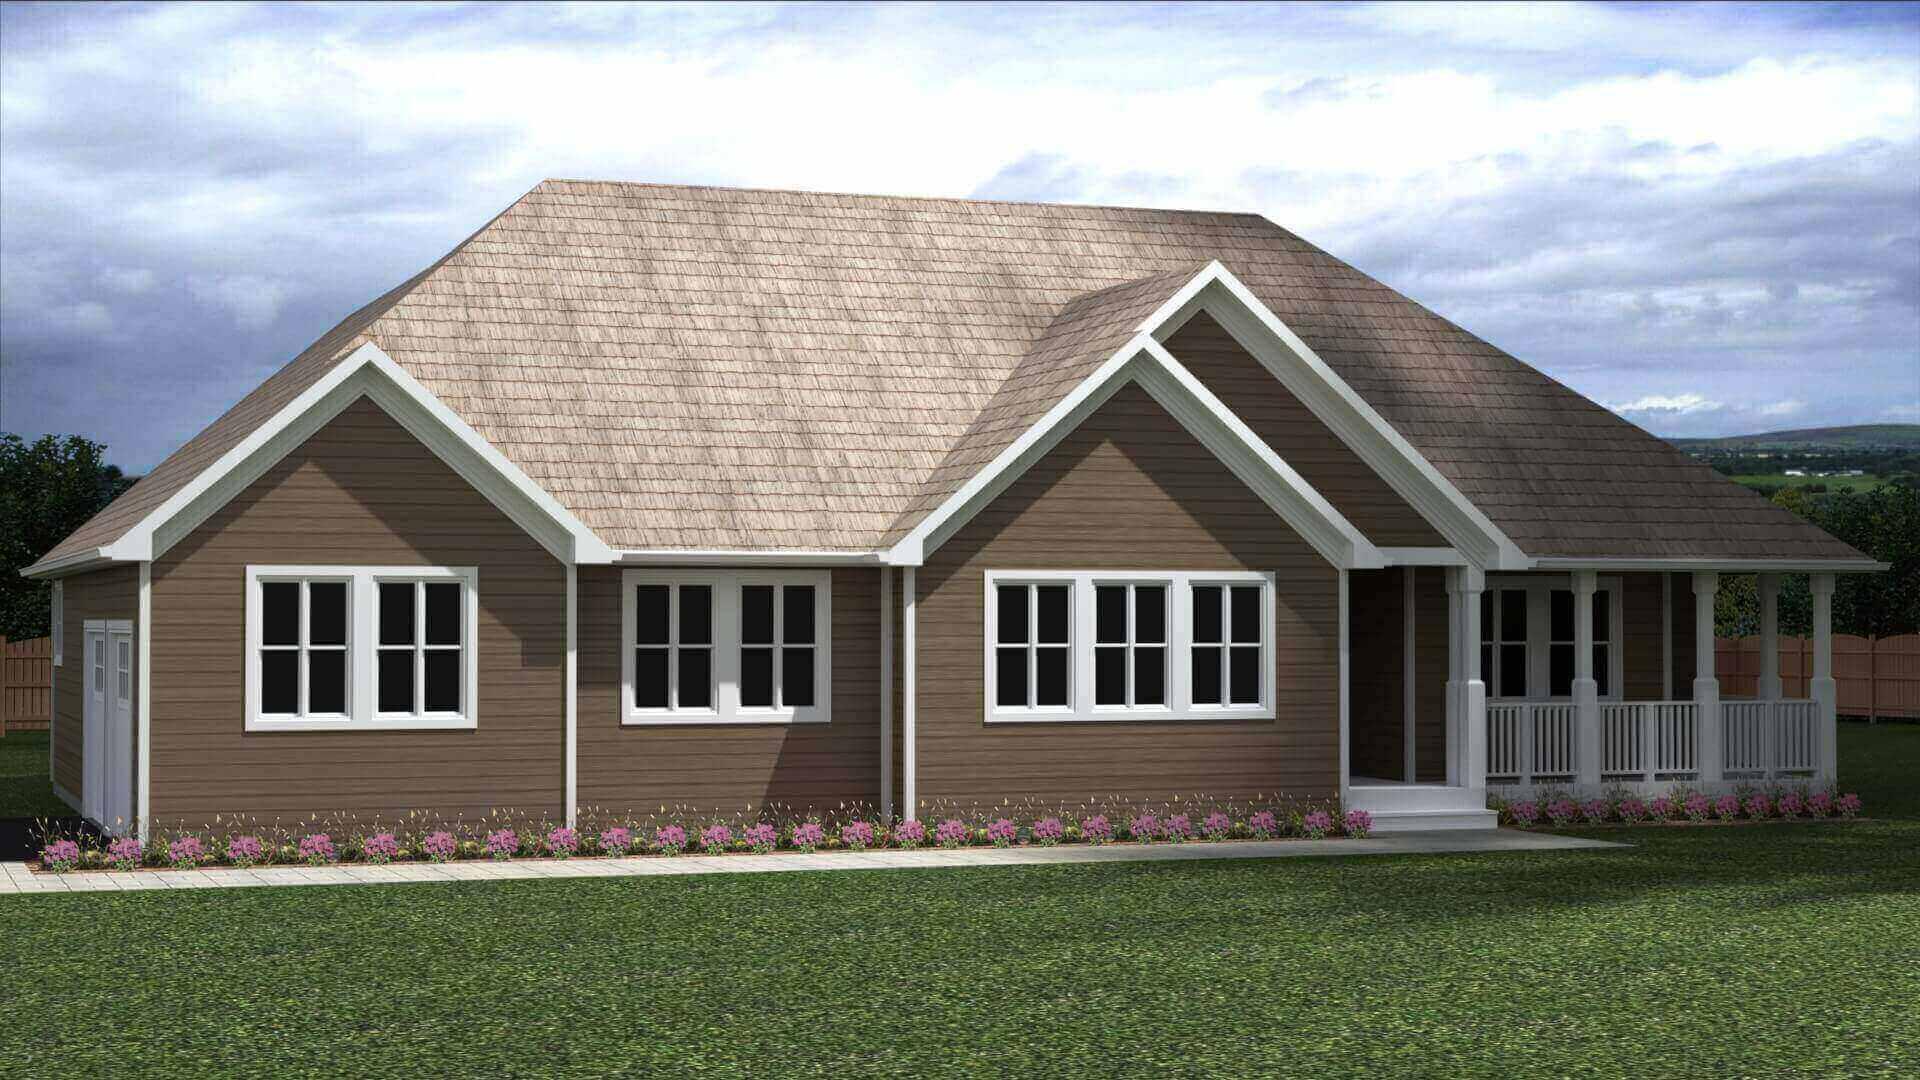 1523B house elevation